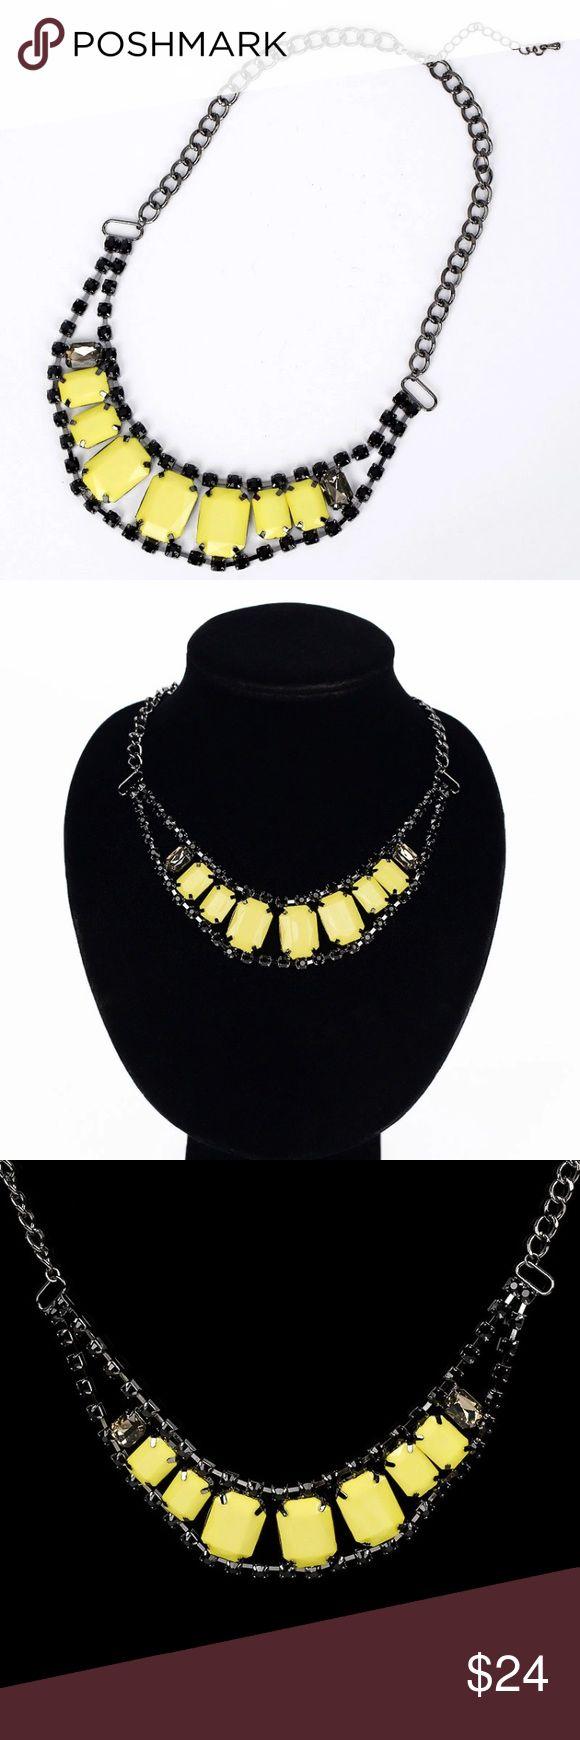 Yellow and black rhinestone collar necklace Neon yellow and black statement collar adjustable rhinestone necklace. Jewelry Necklaces